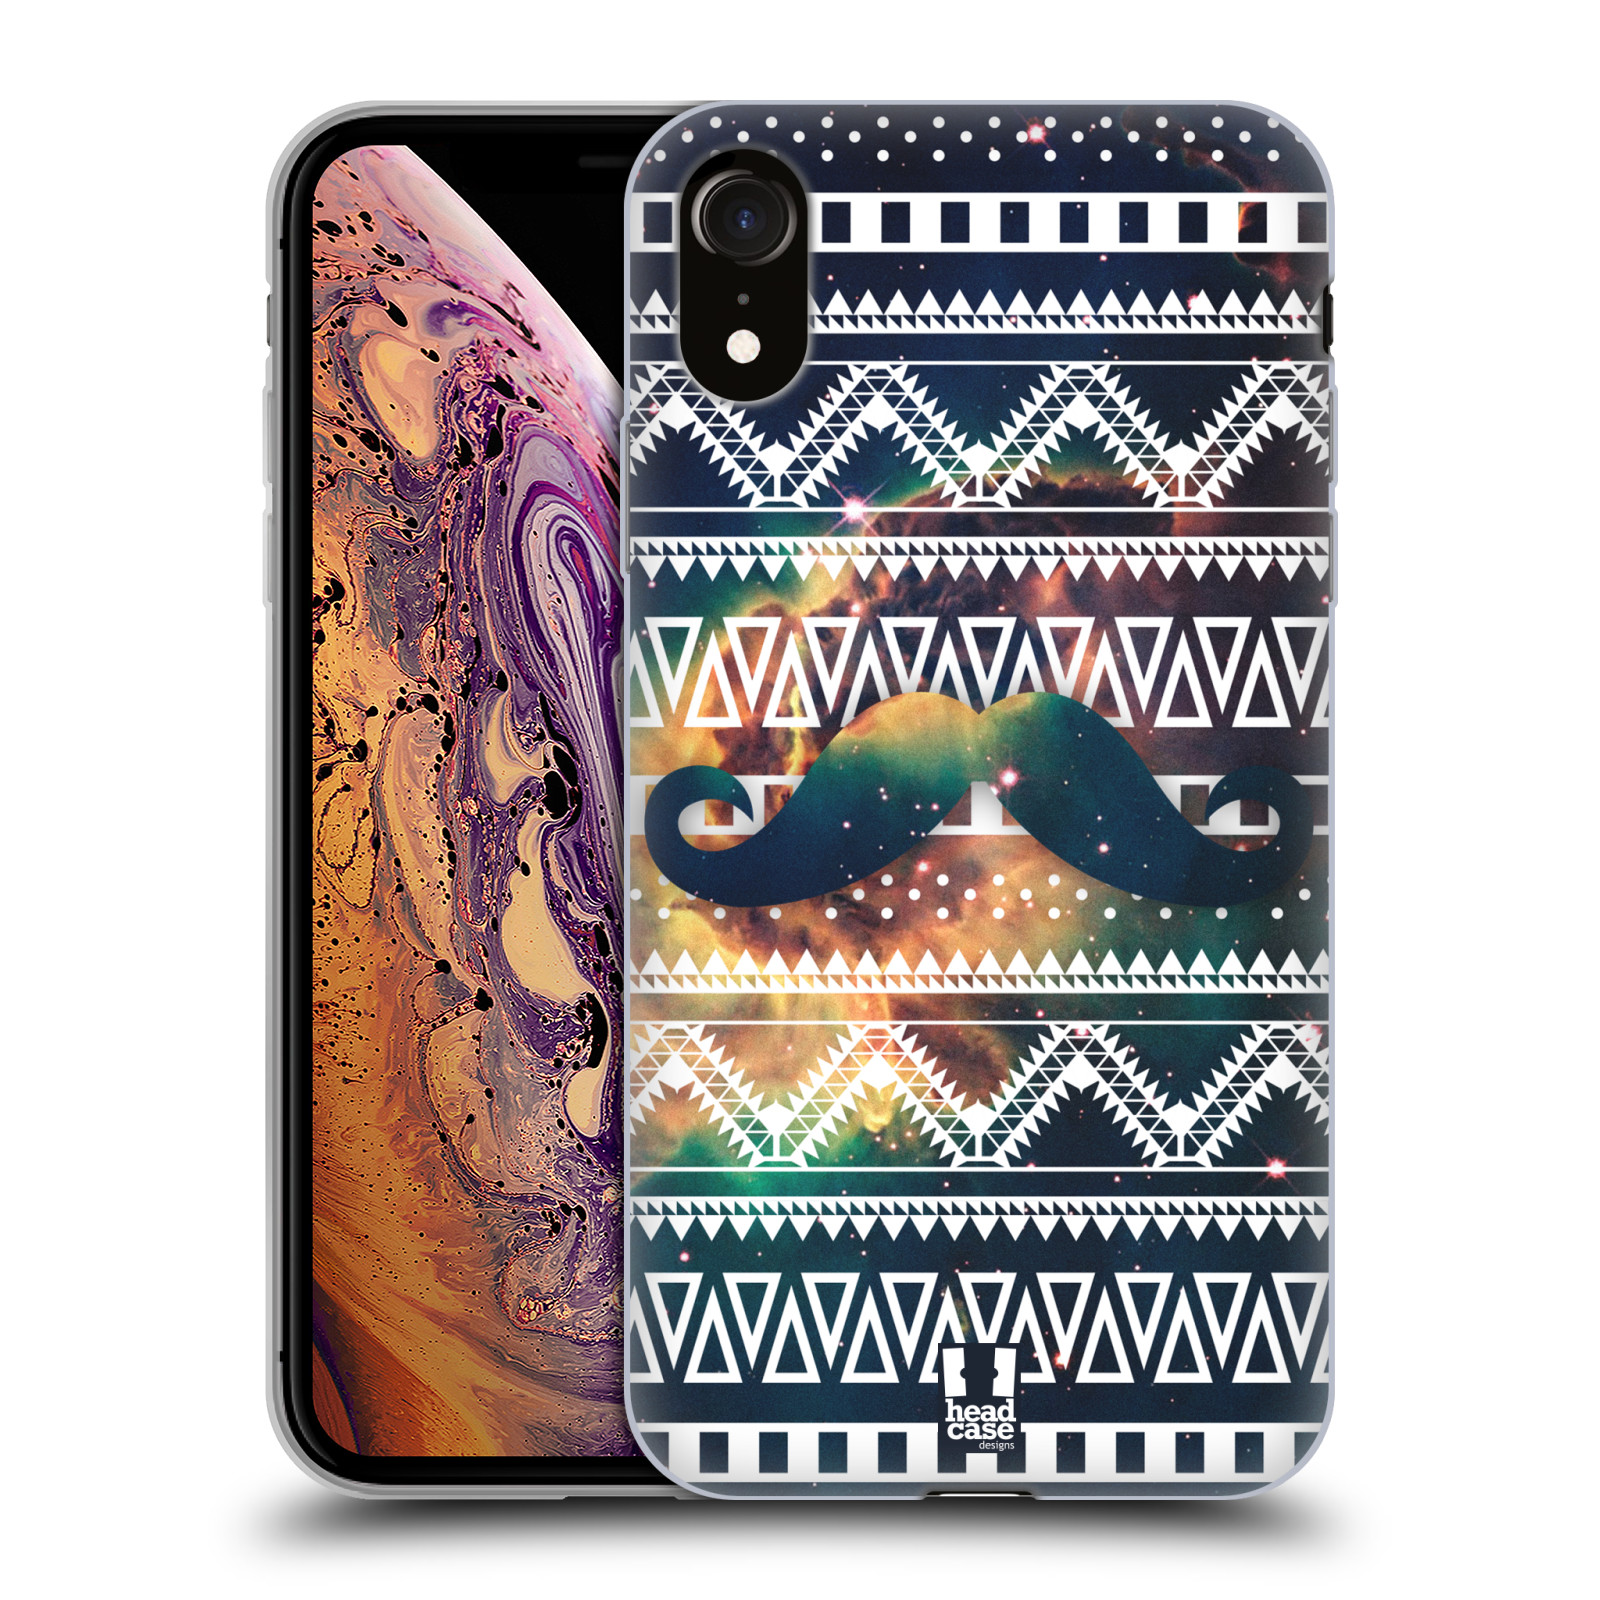 Silikonové pouzdro na mobil Apple iPhone XR - Head Case - AZTEC KNÍR